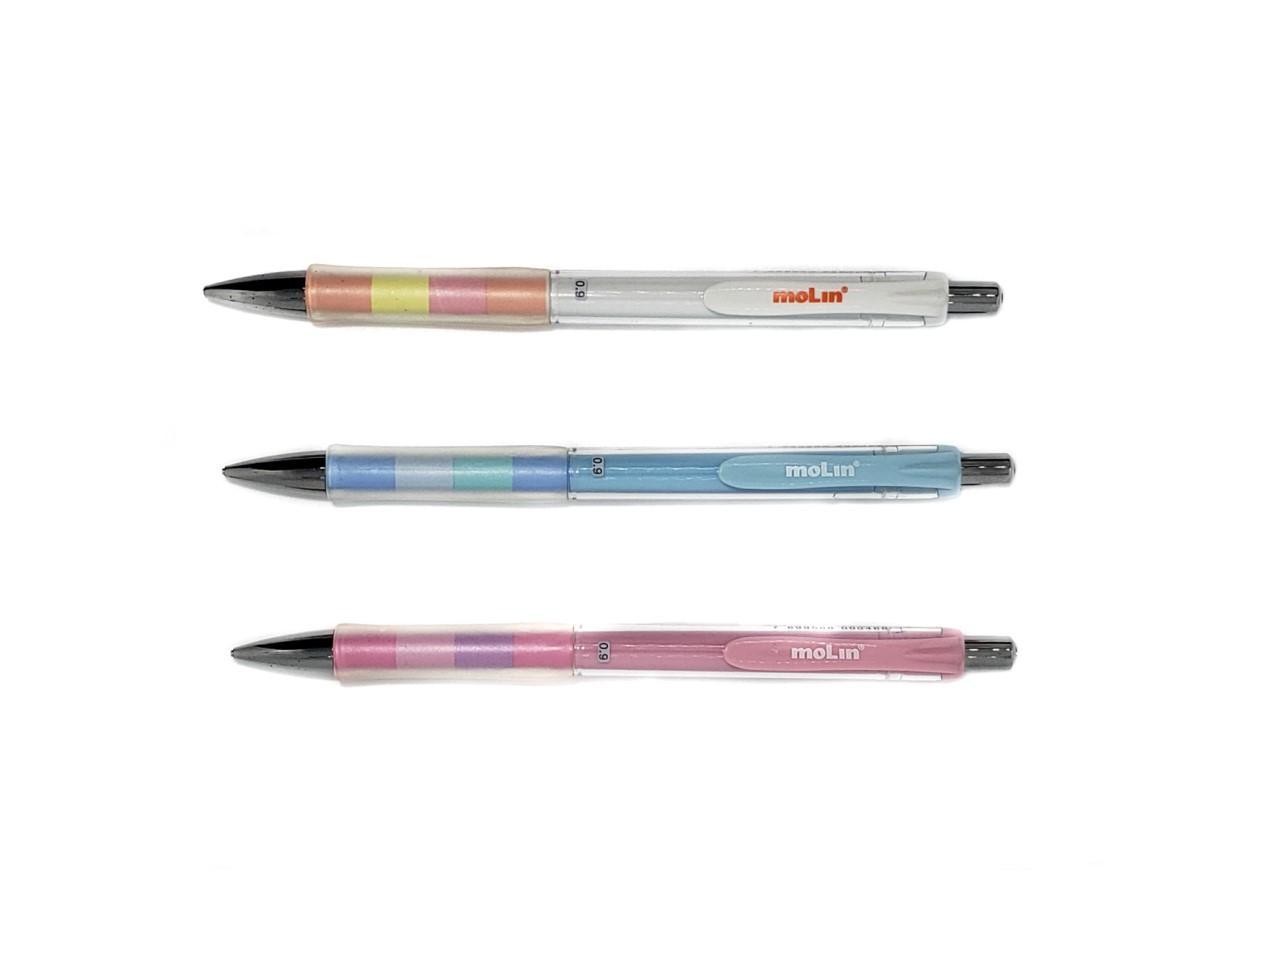 Lapiseira WPK 0,9mm Cores - Rosa